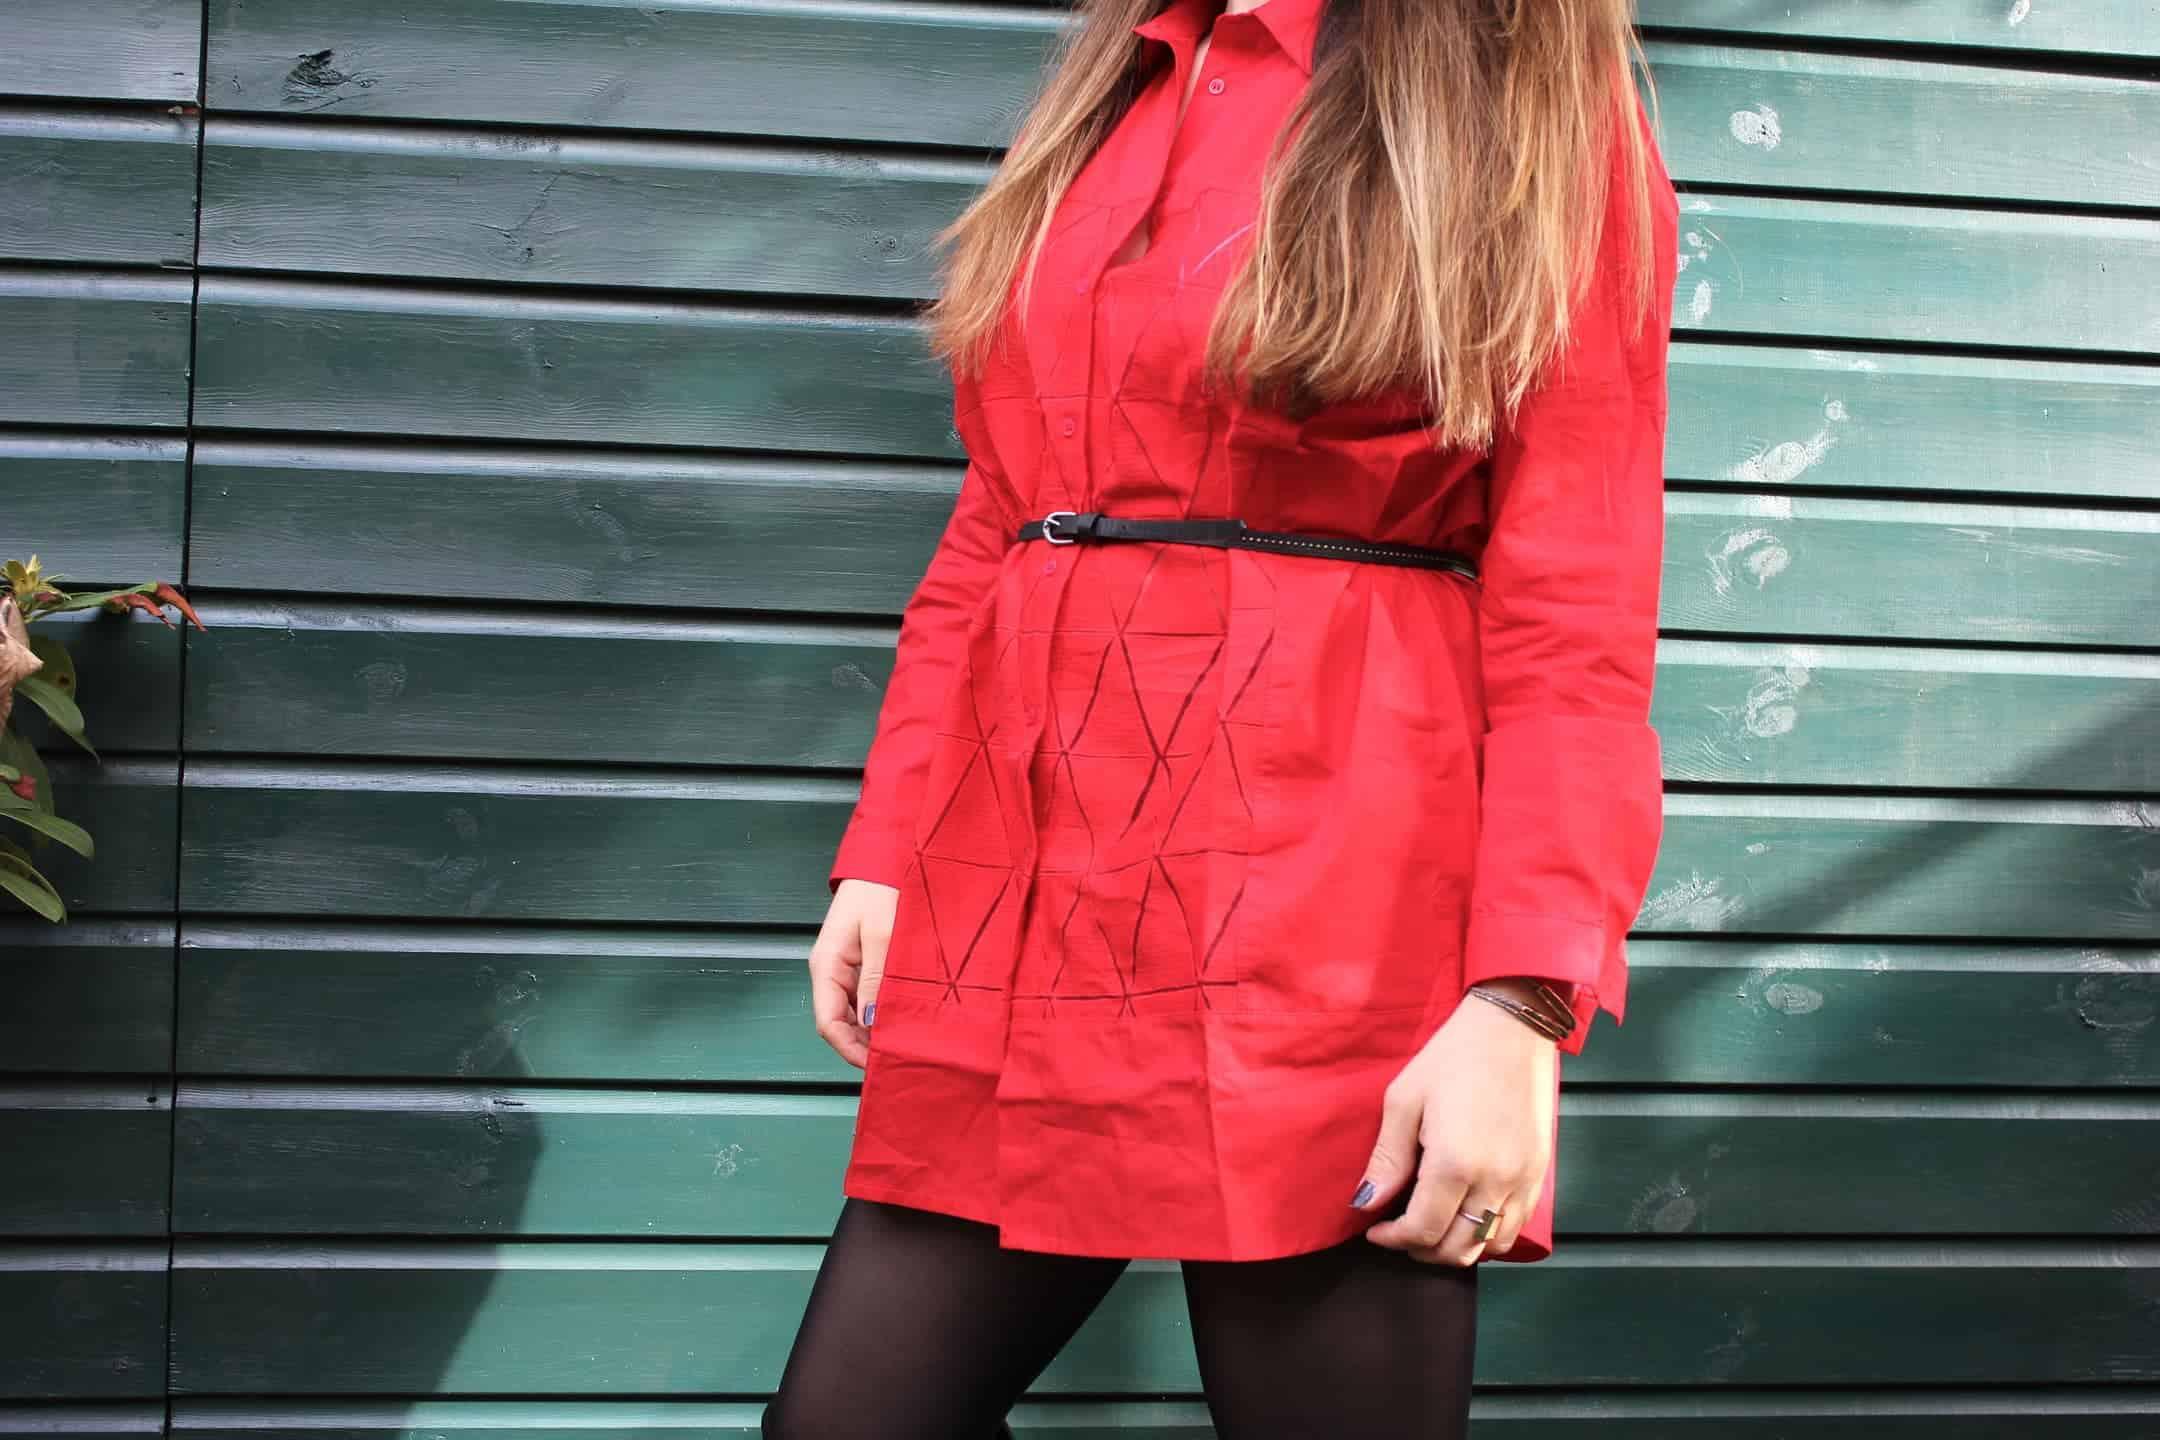 How to wear red this season, FashionBite